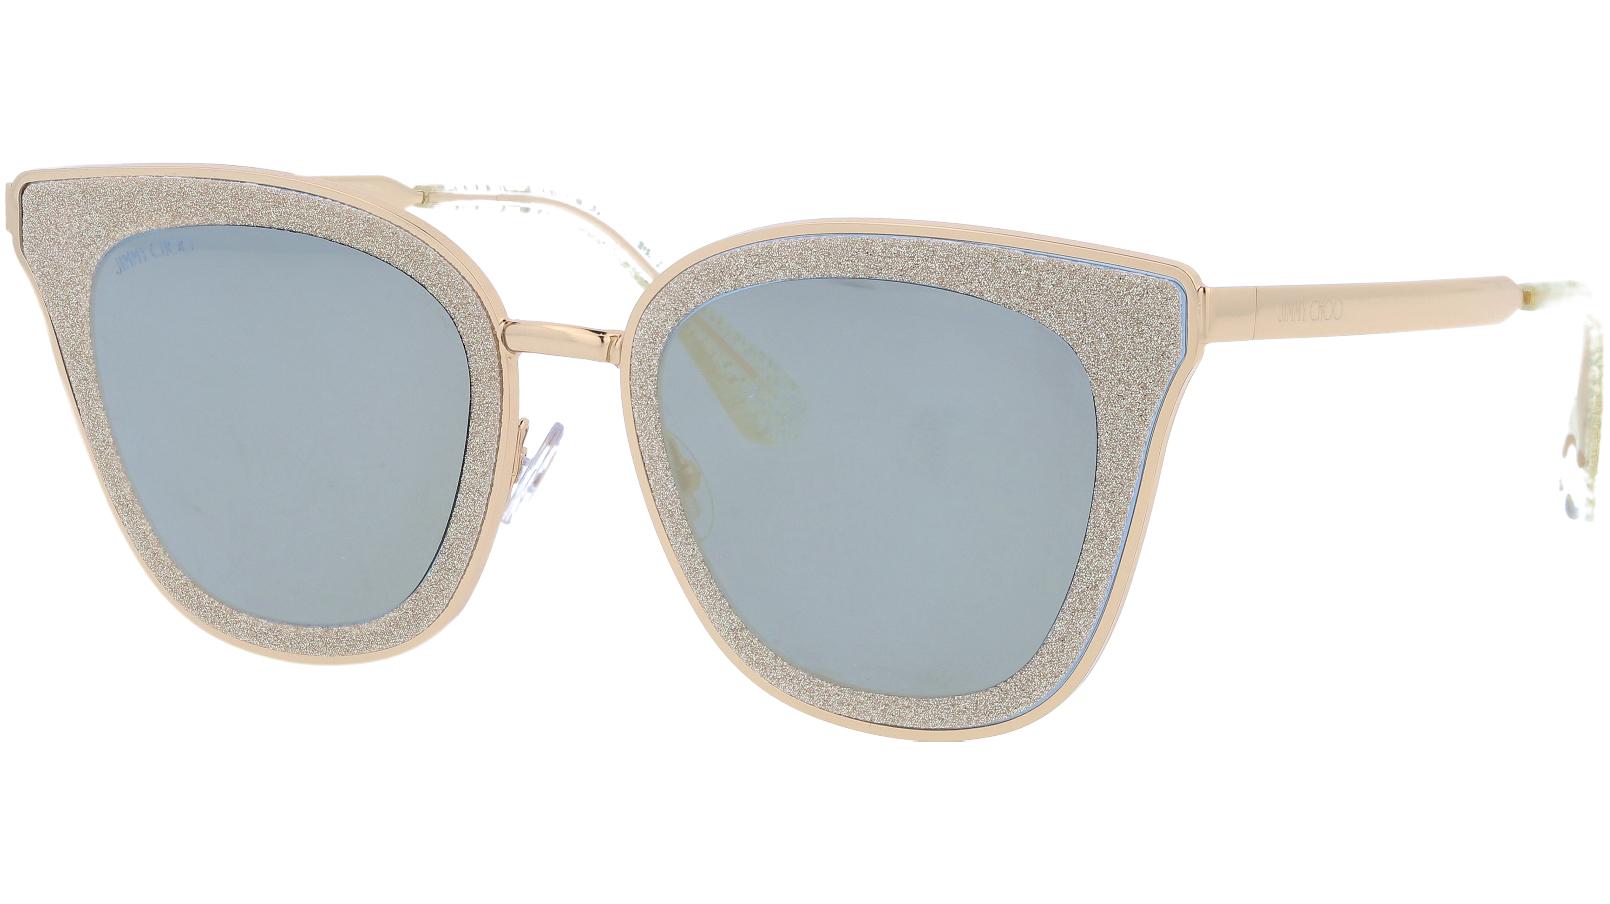 JIMMY CHOO LIZZYS YK9JL 63 BURG Sunglasses